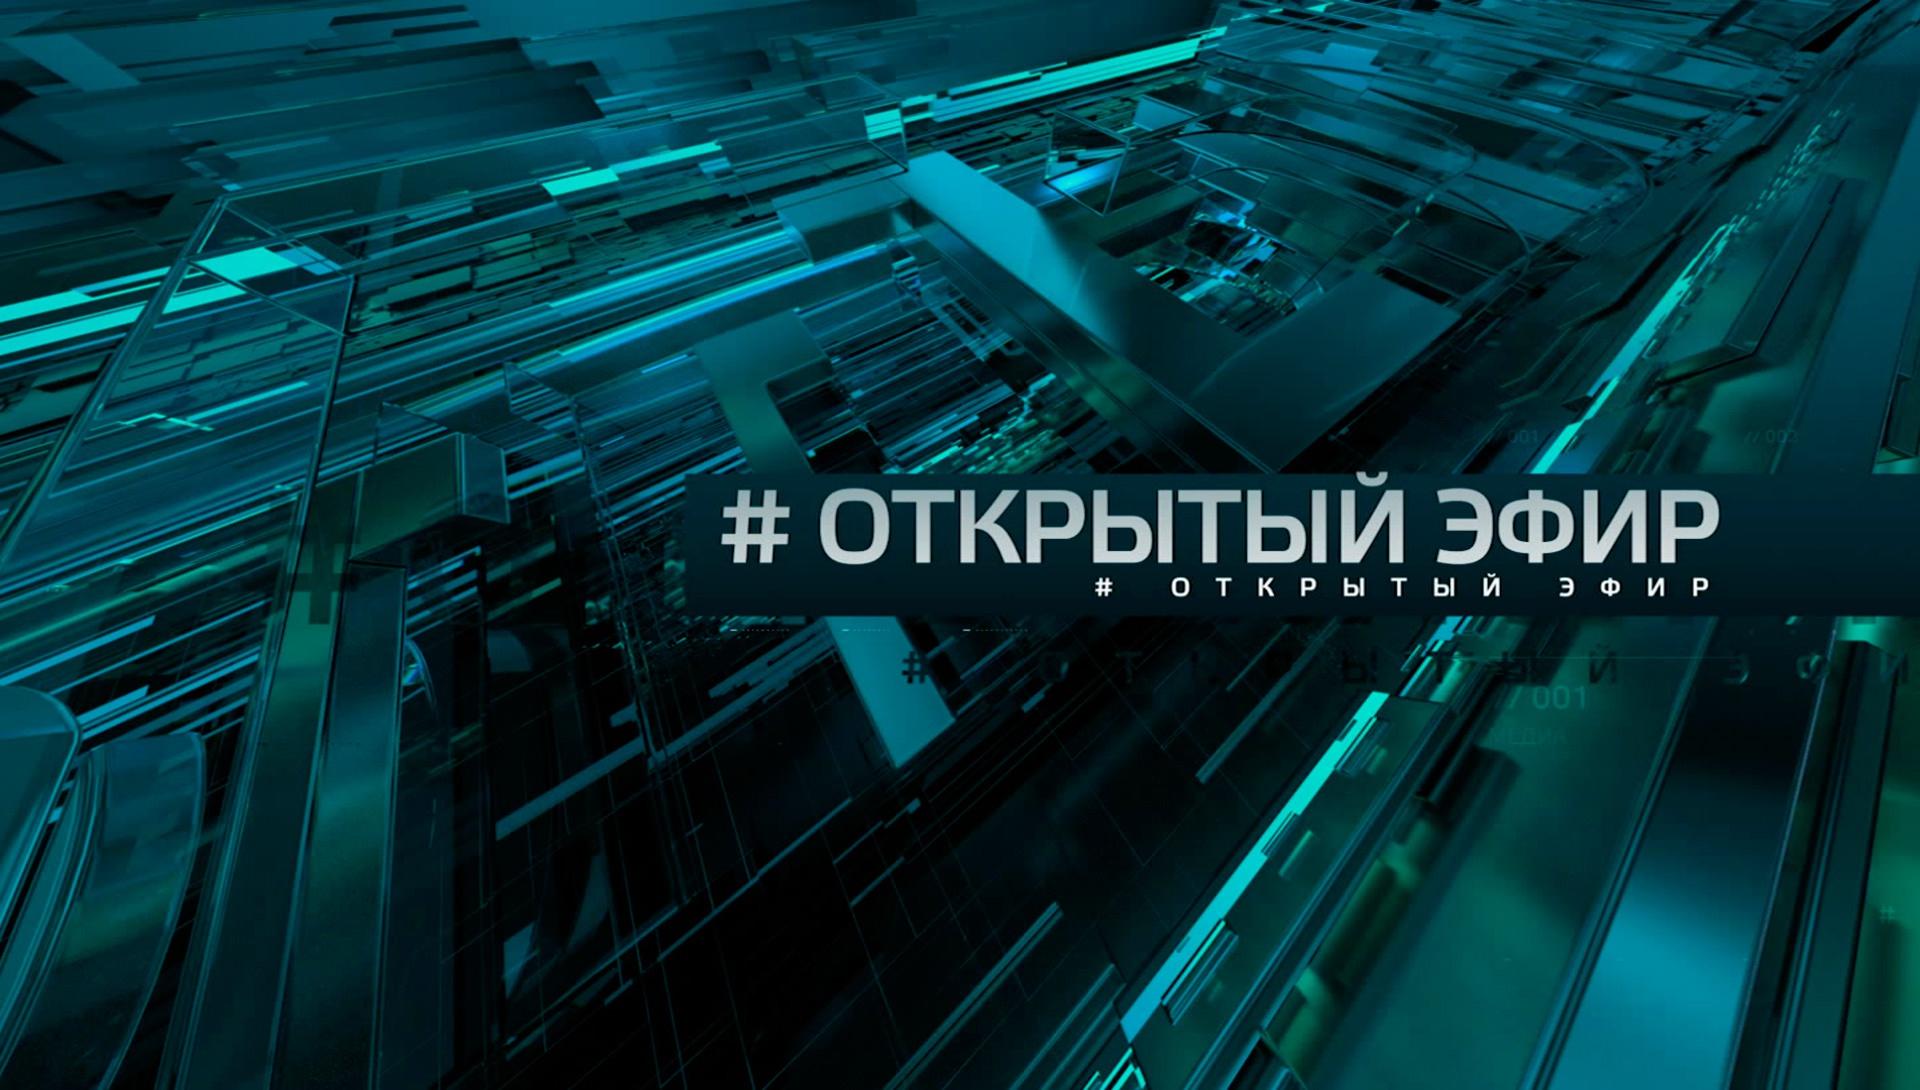 https://mcdn.tvzvezda.ru/storage/news_other_images/2020/09/16/e93b84c5dcb942479f032e099caea9da.jpg